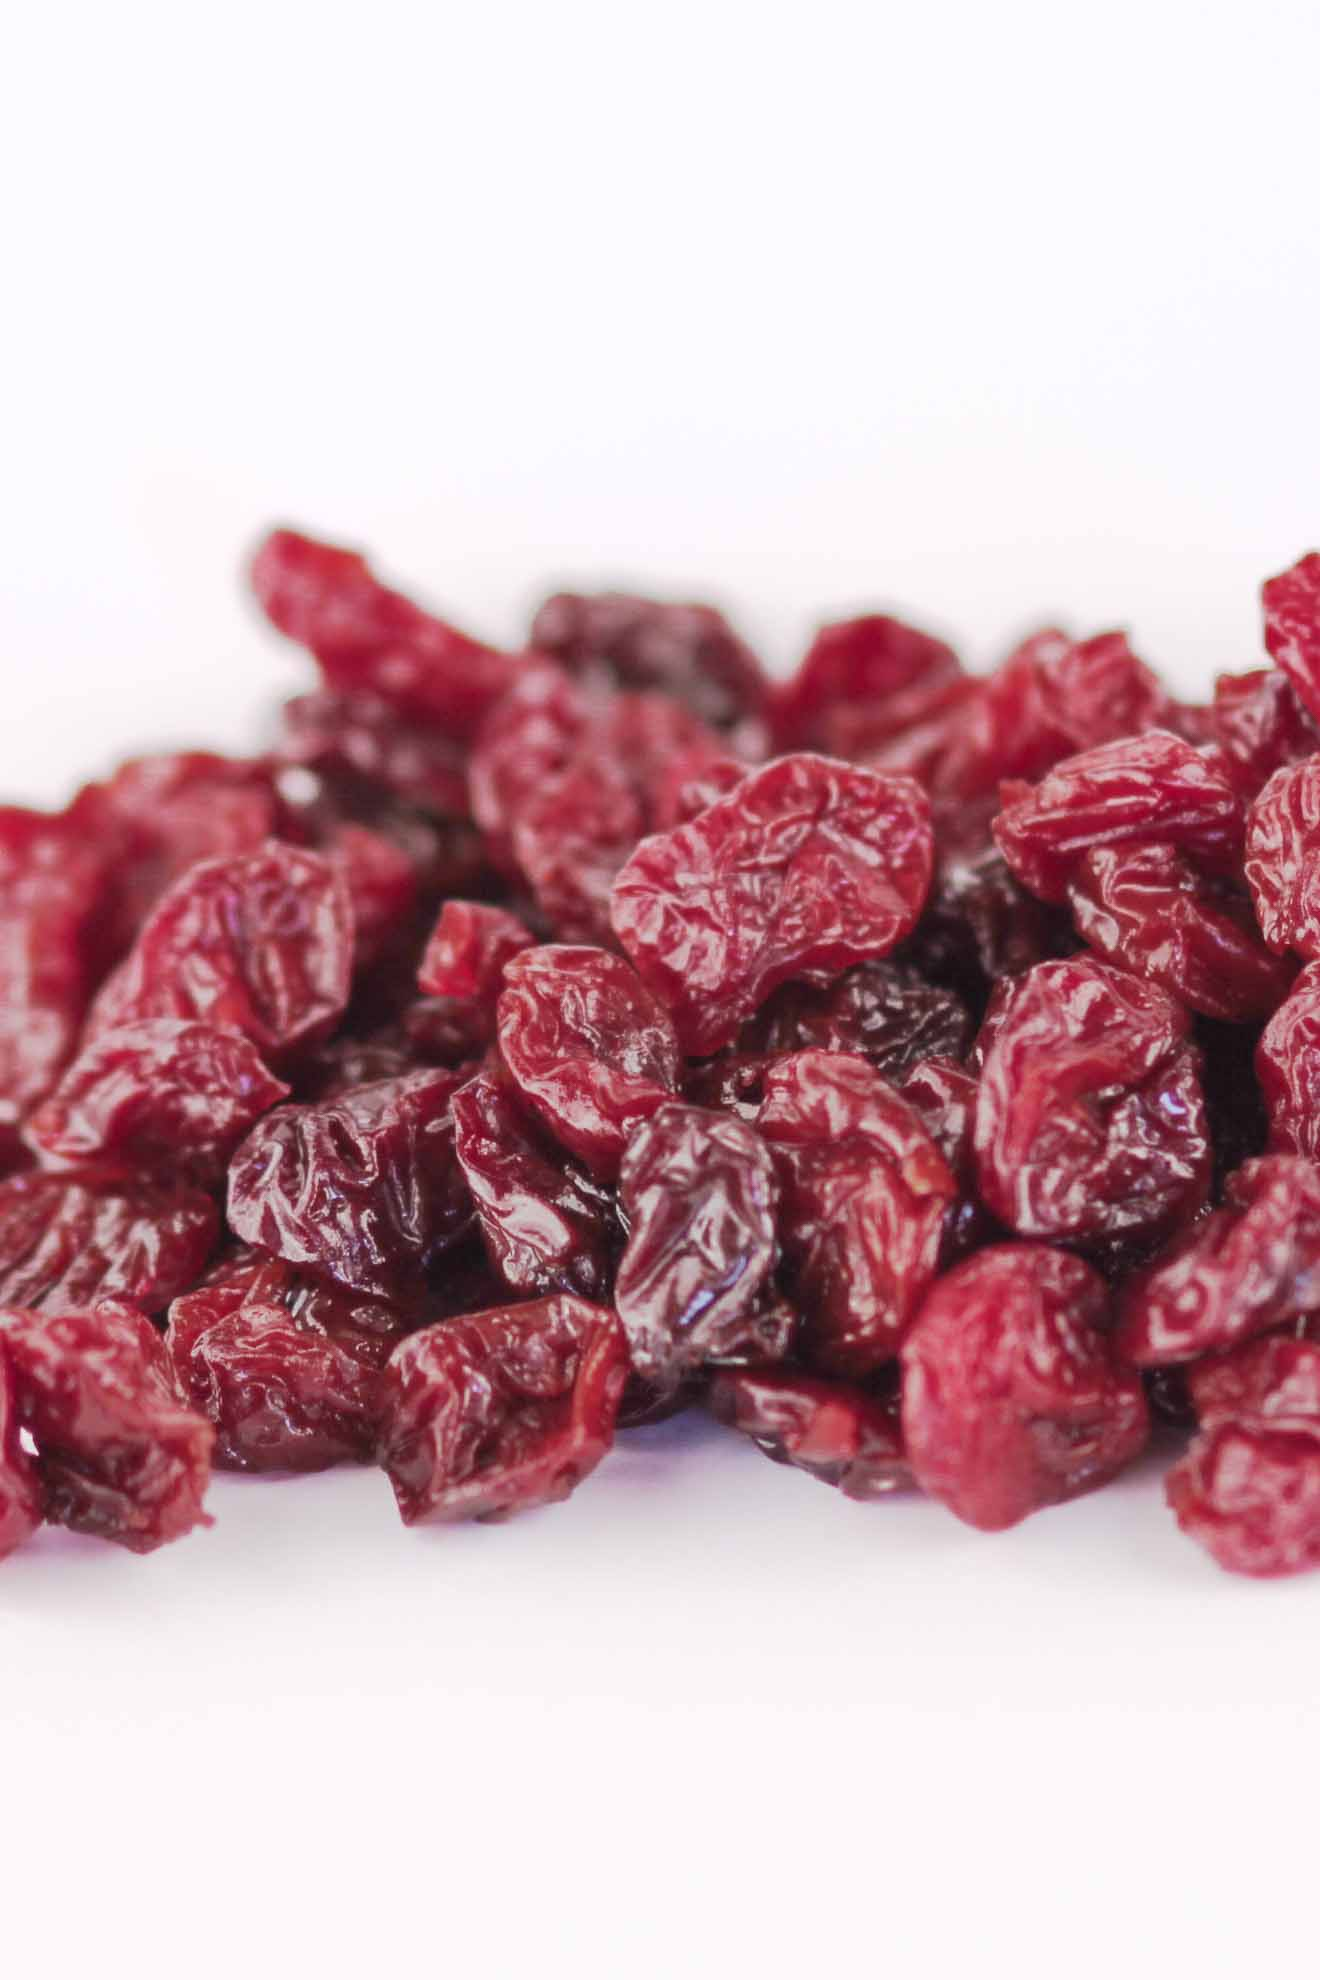 dried cherries rowleys red barn